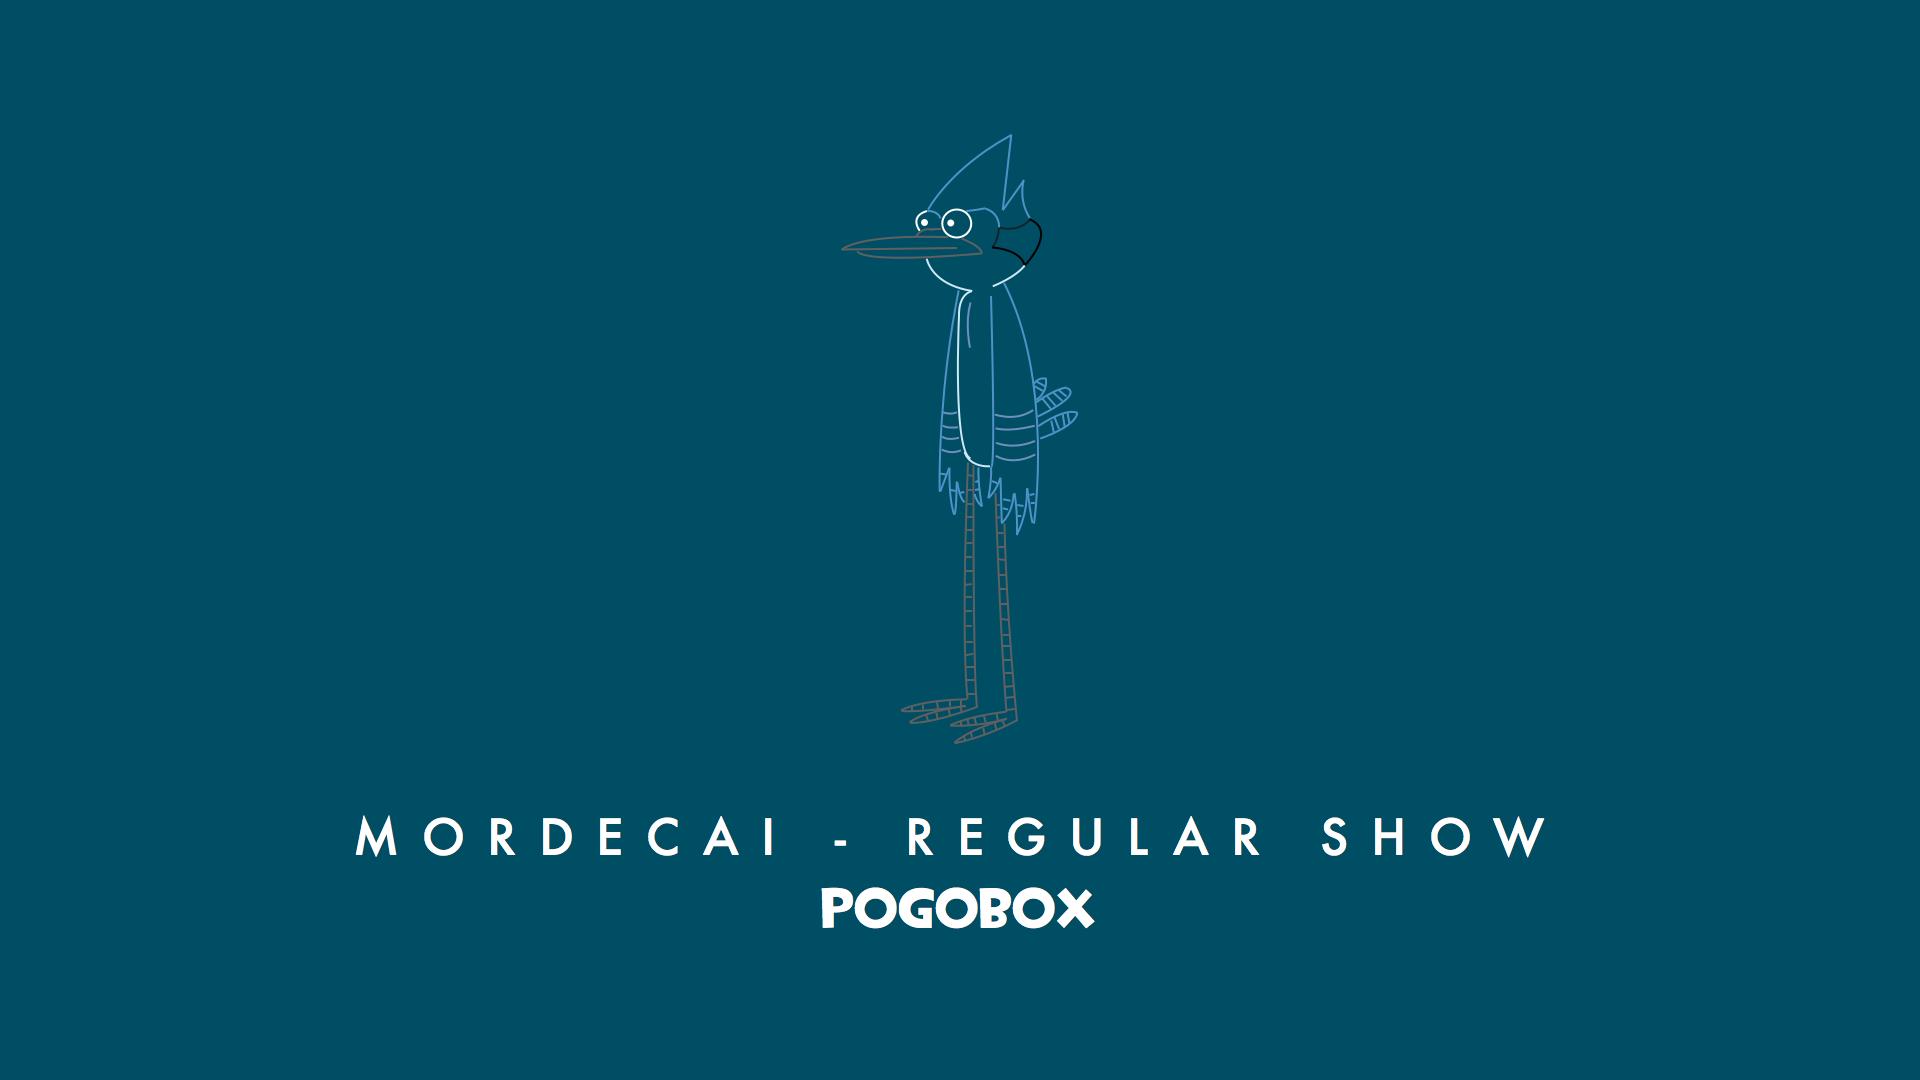 MORDECAI REGULAR SHOW POGOBOx Mordecai Hi Five Ghost Rigby Text Font